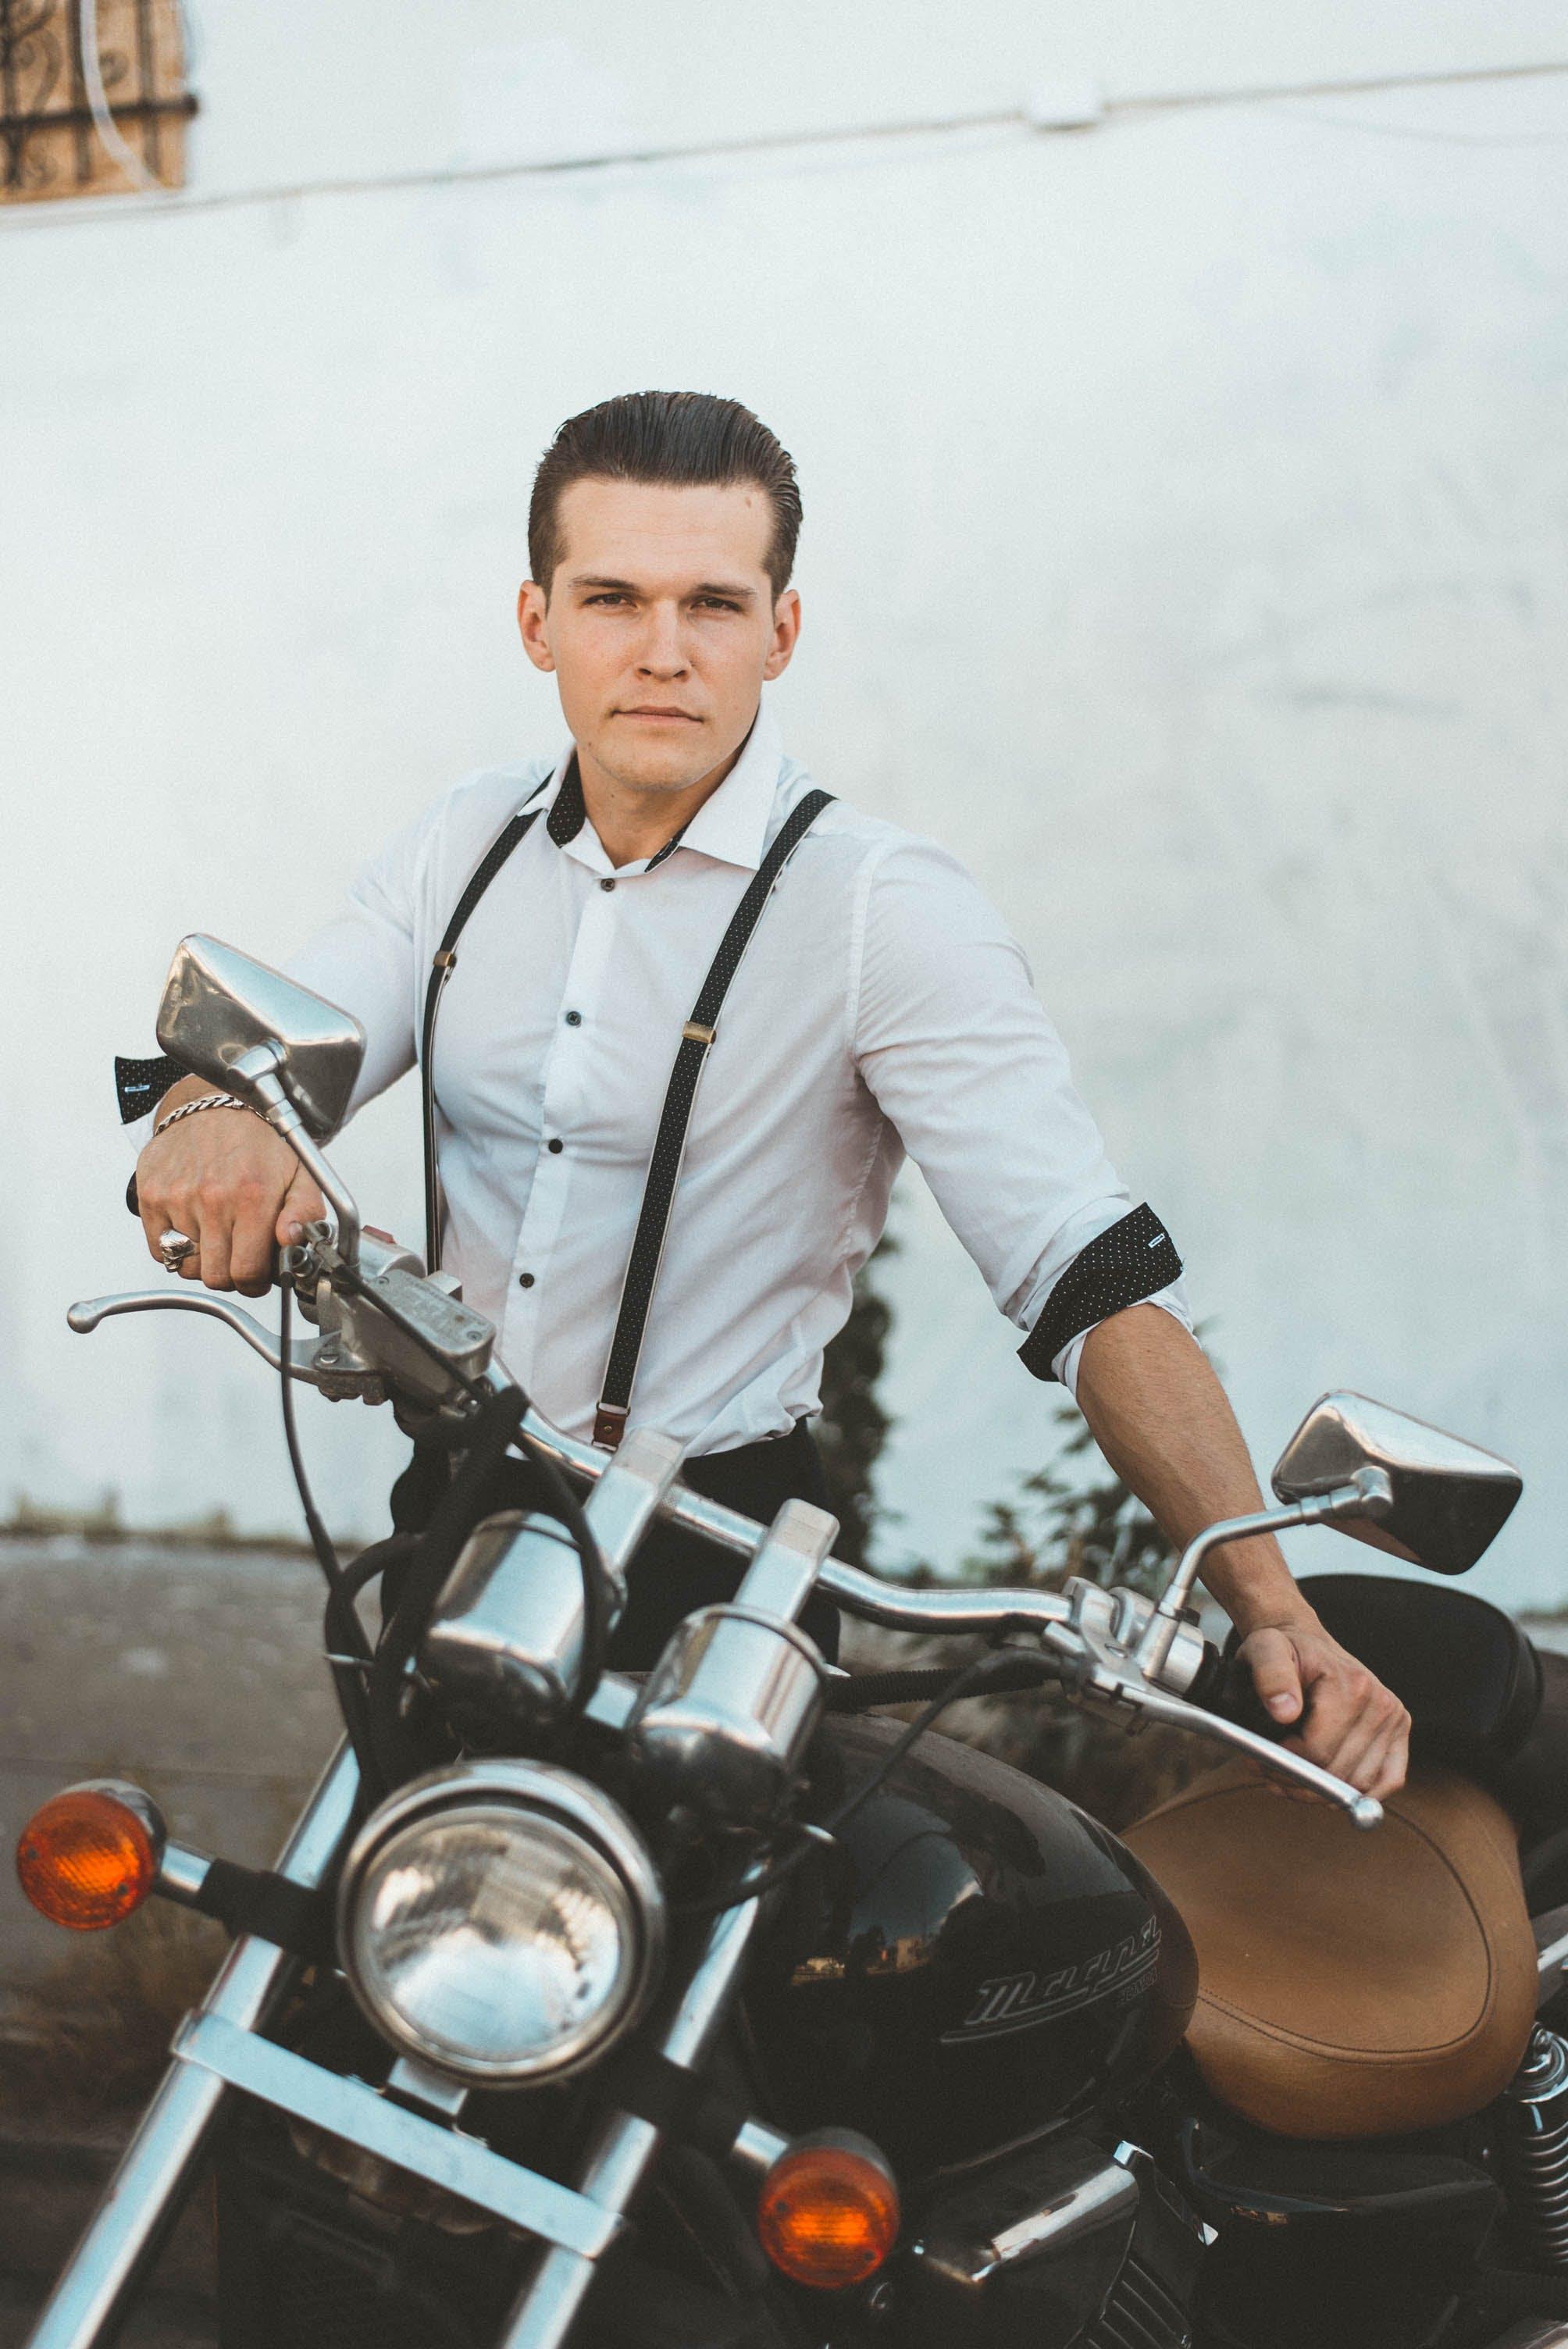 Man in White Dress Shirt Standing Beside Black Motorcycle